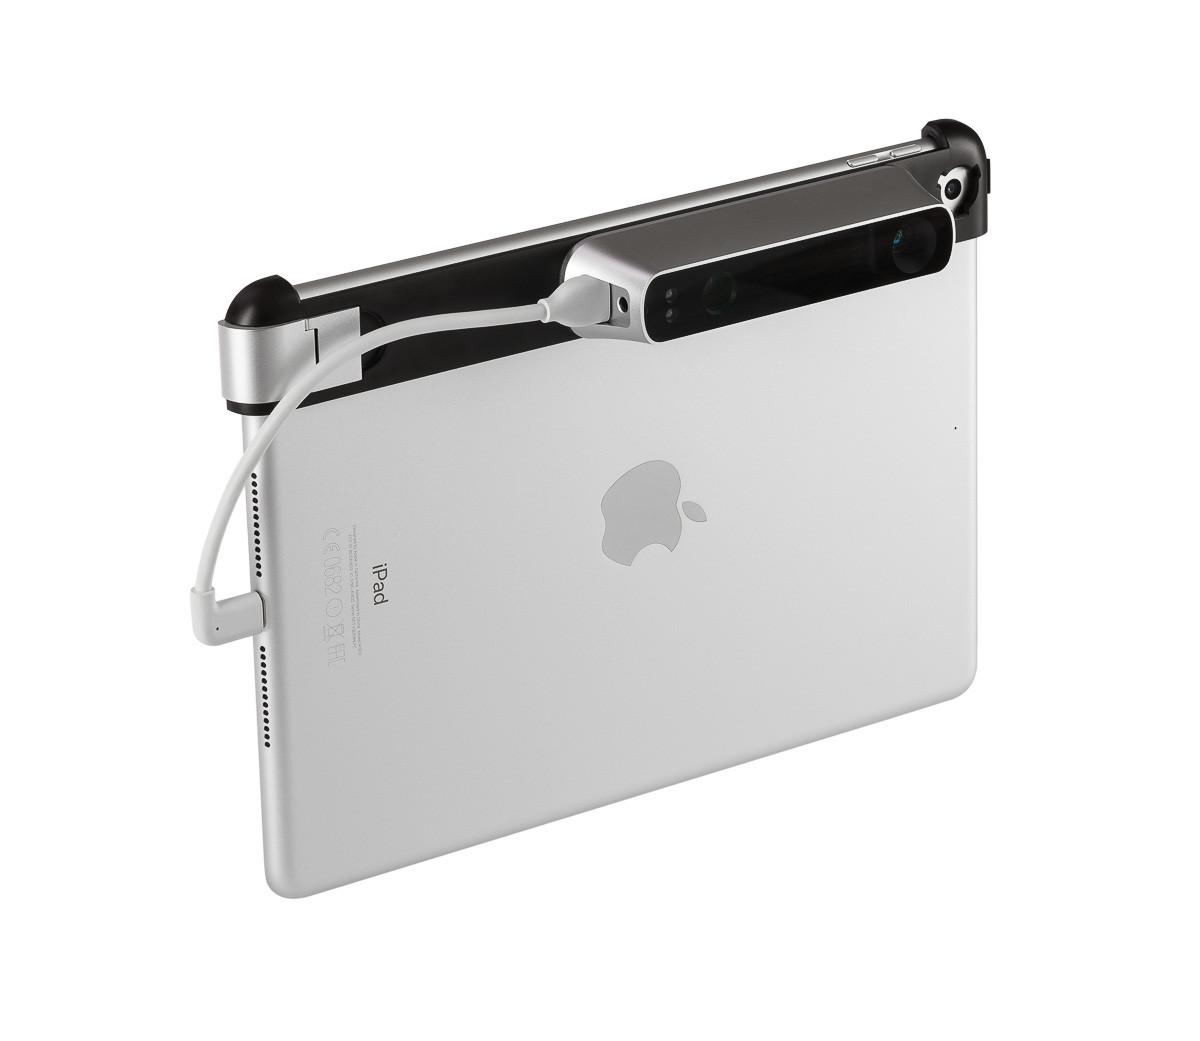 iPad and case_Ipad side 45 degrees